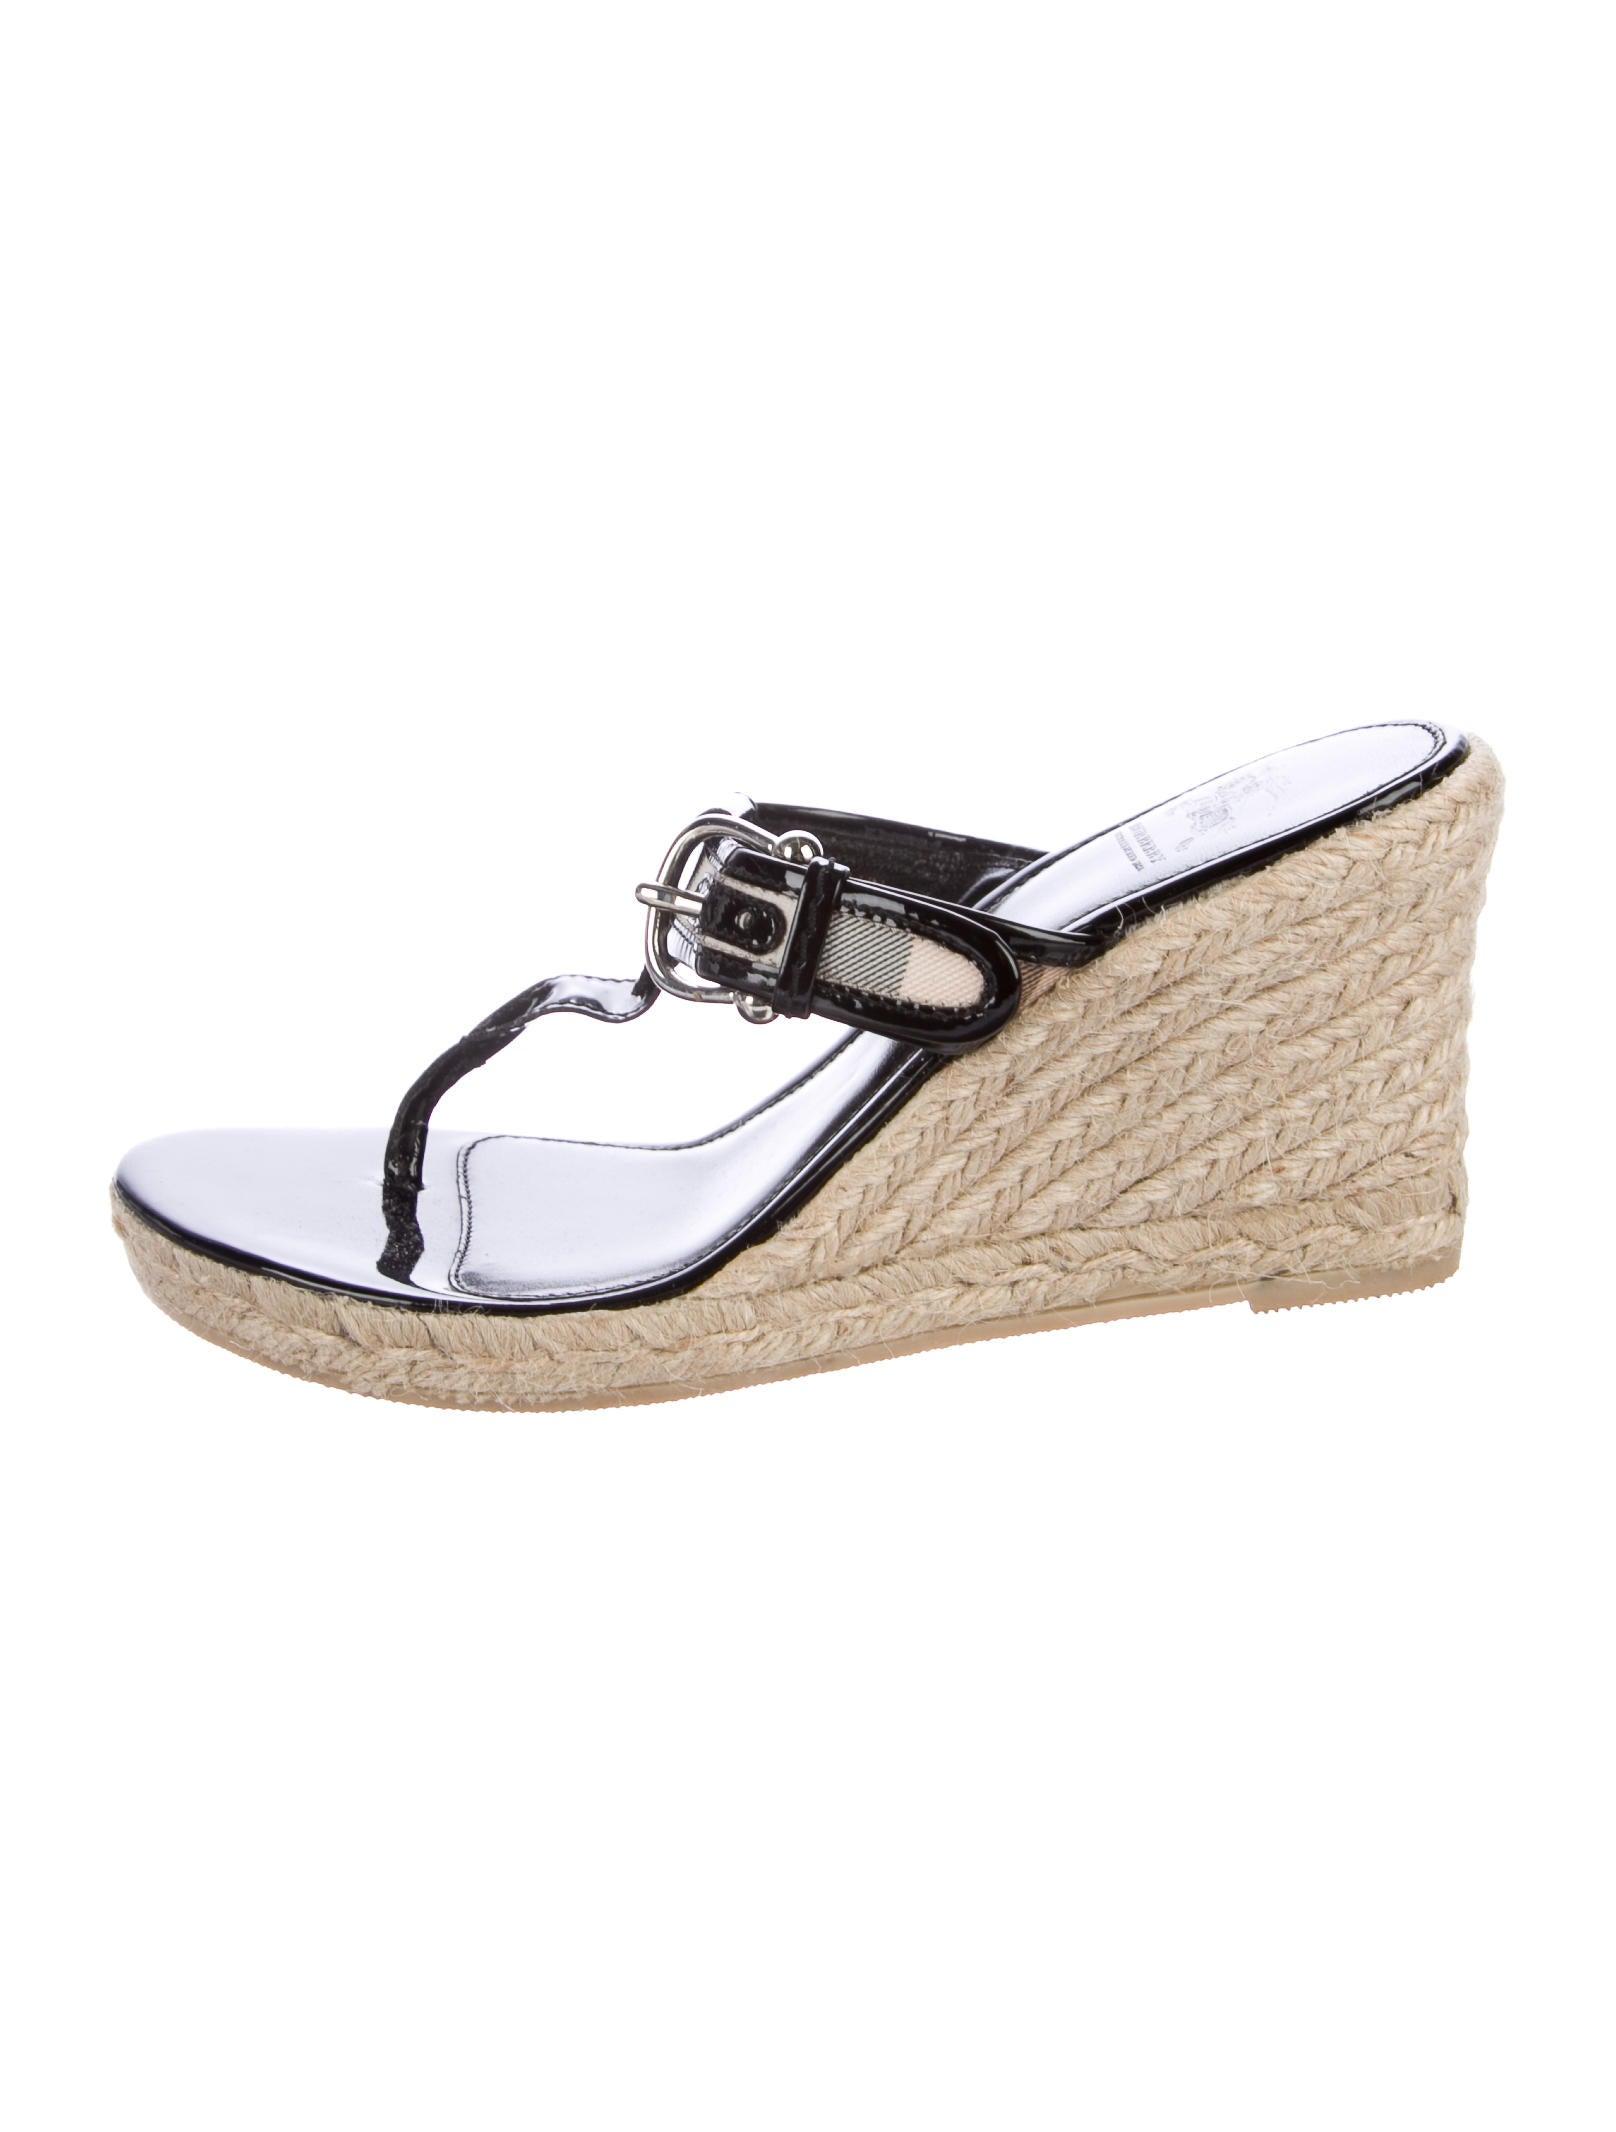 e5a98d50b7c Burberry Super Nova Check Espadrille Sandals - Shoes - BUR76674 ...